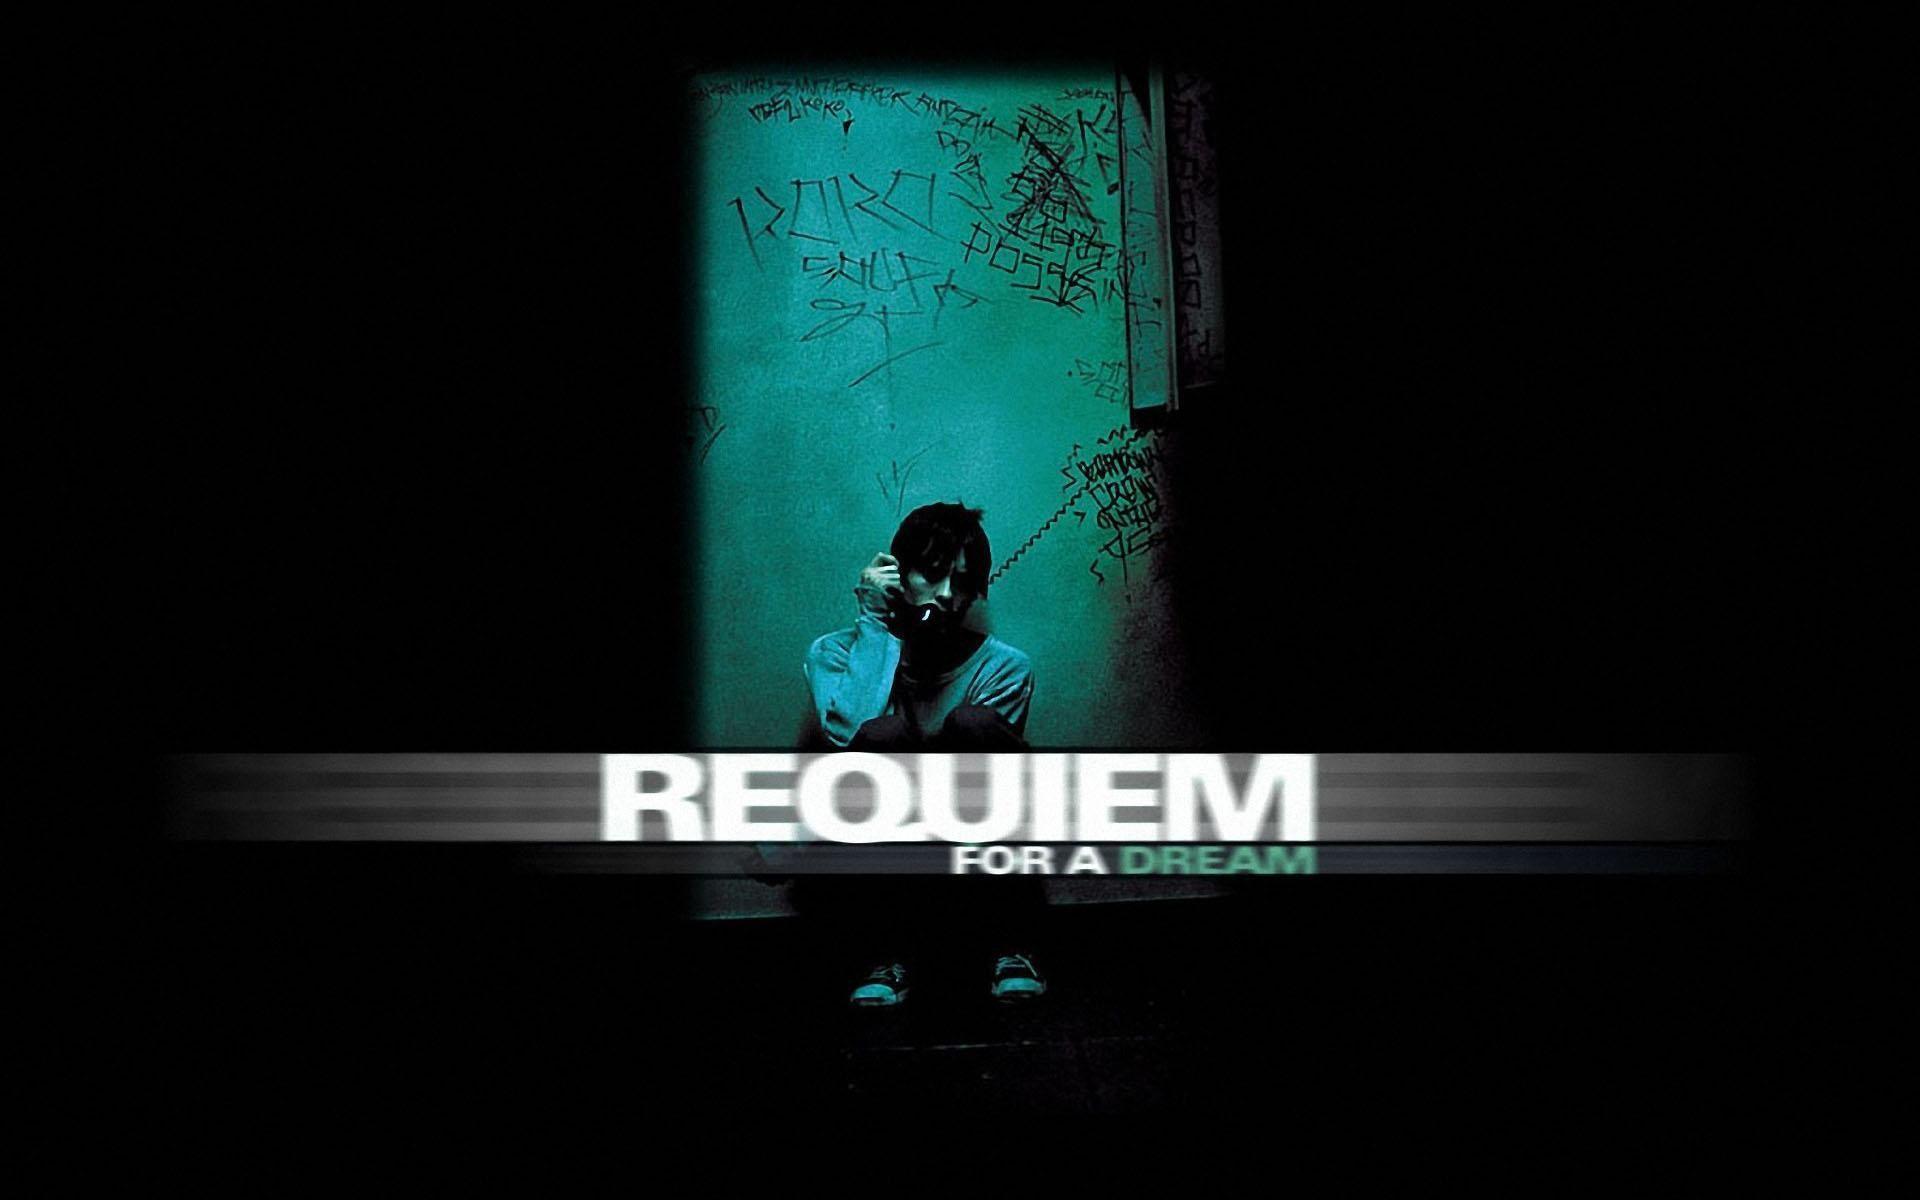 Requiem For A Dream Wallpapers Wallpaper Cave